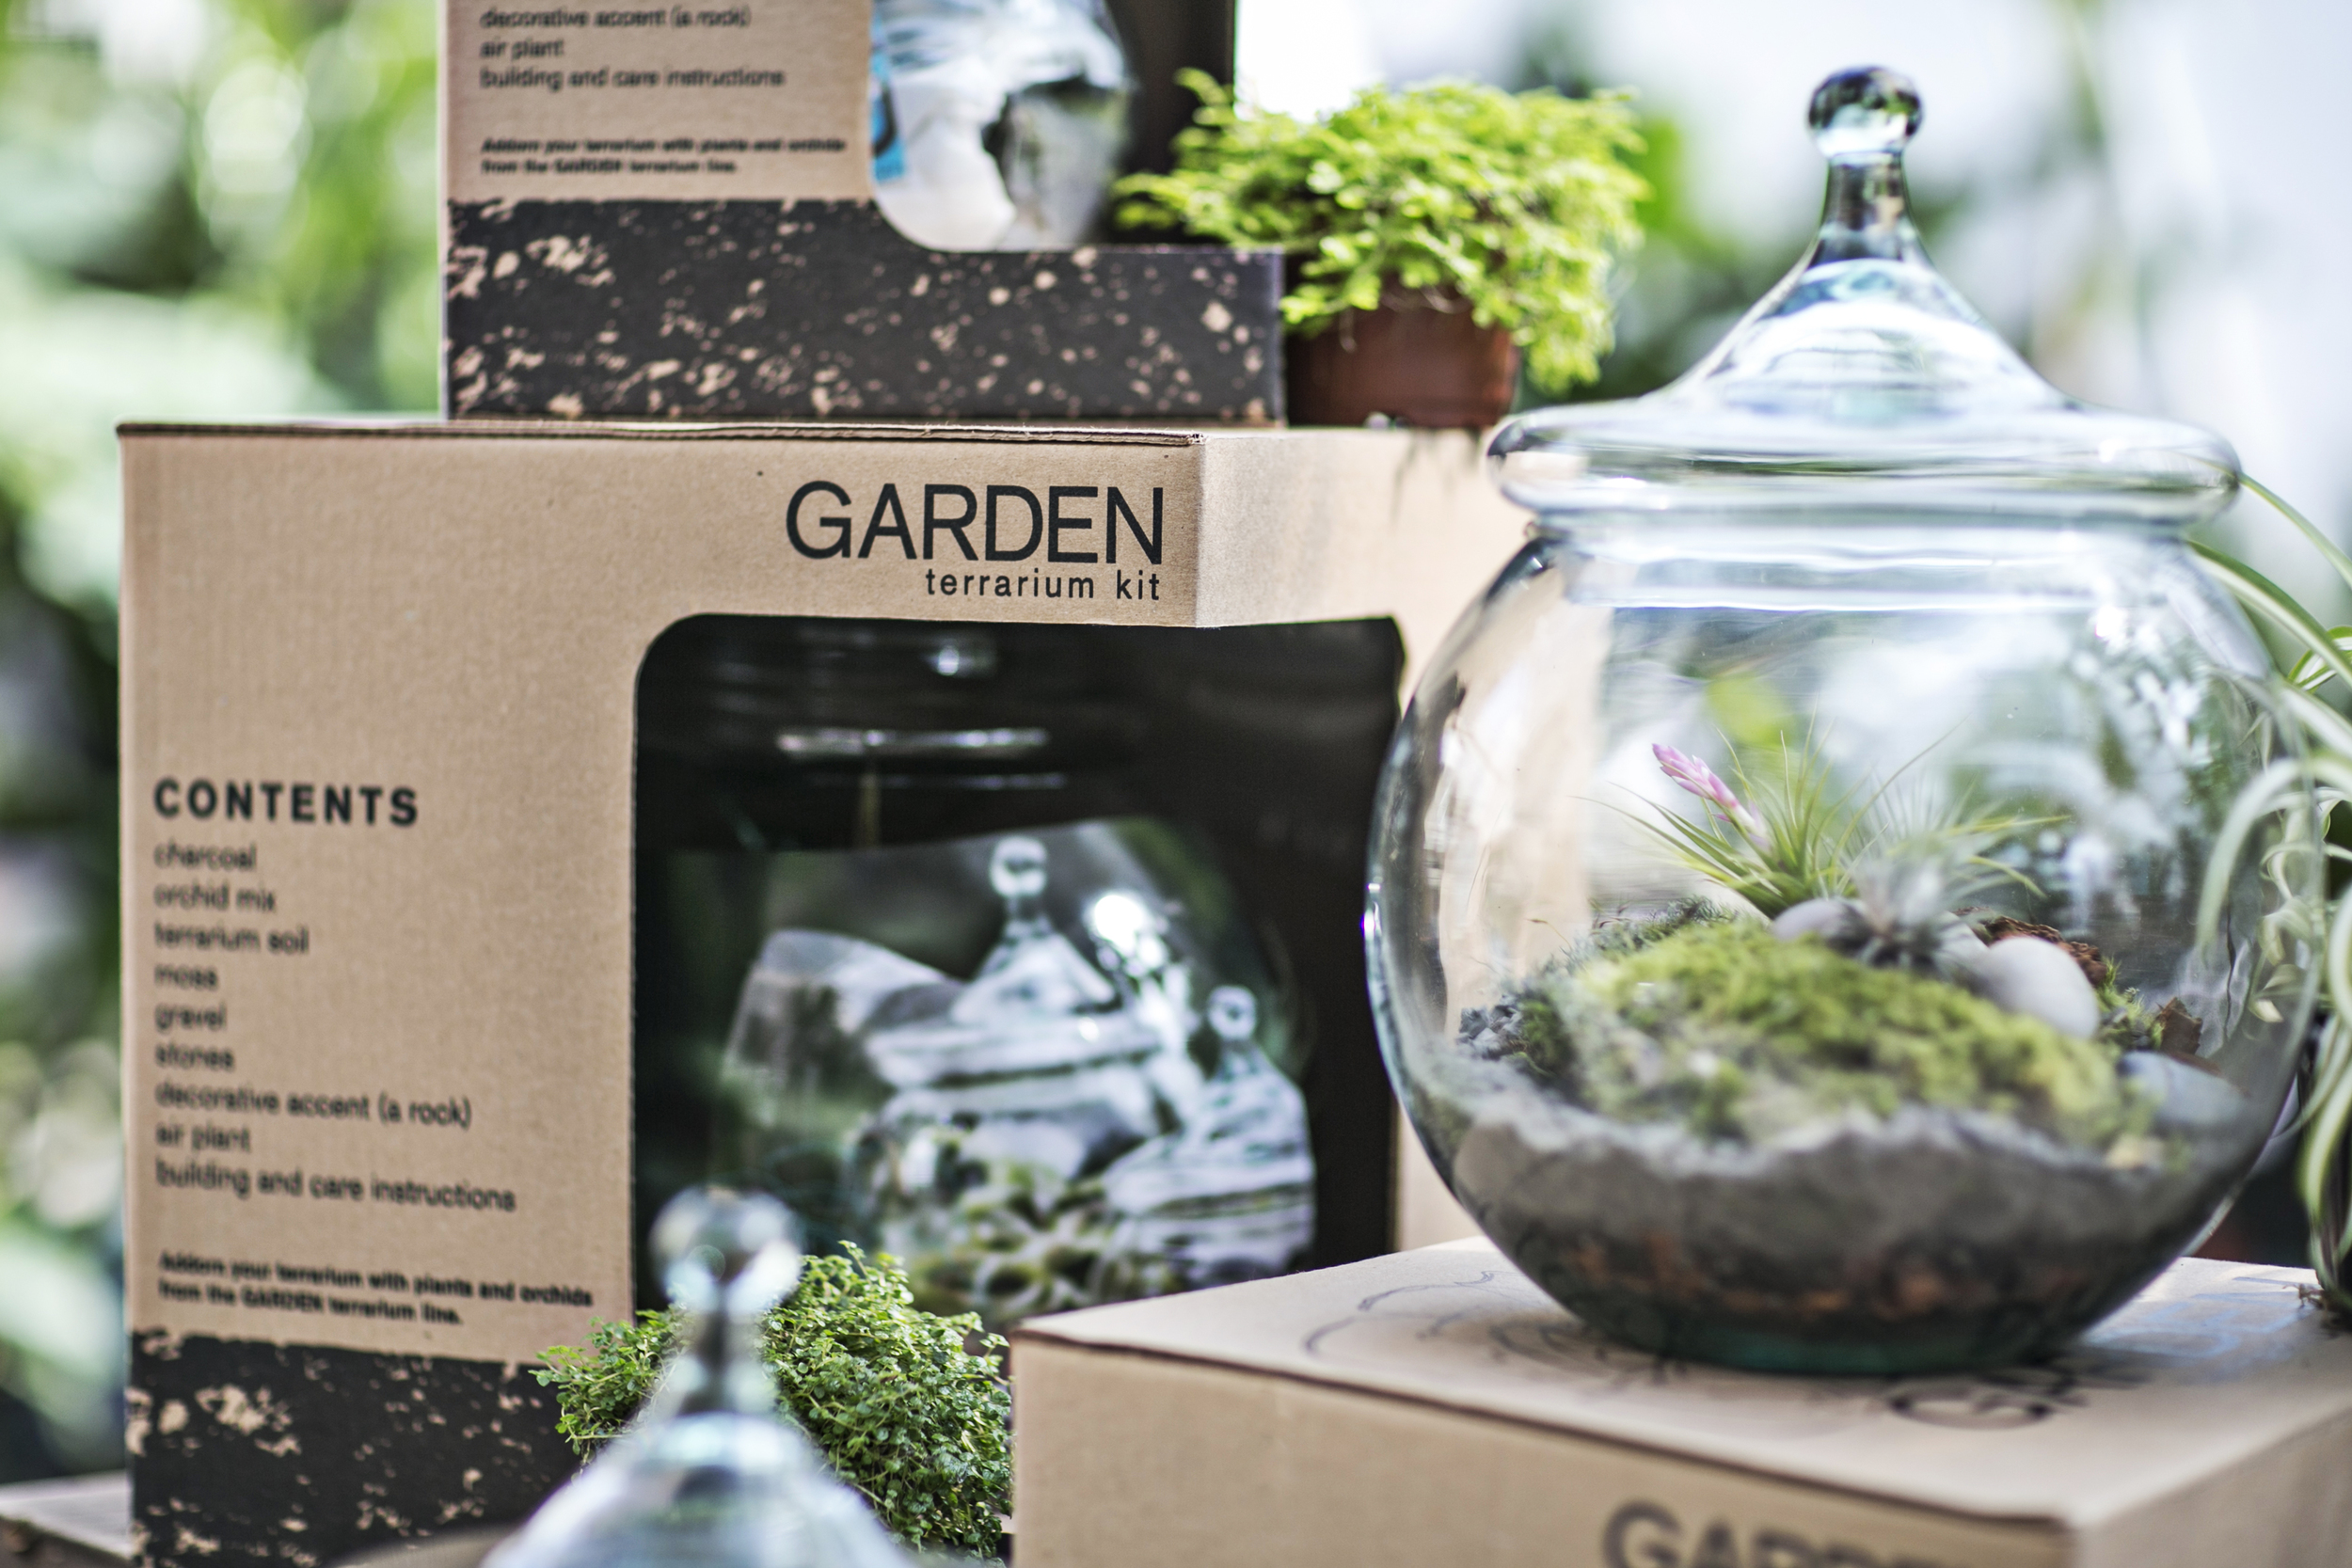 GARDEN terrarium kit design and development